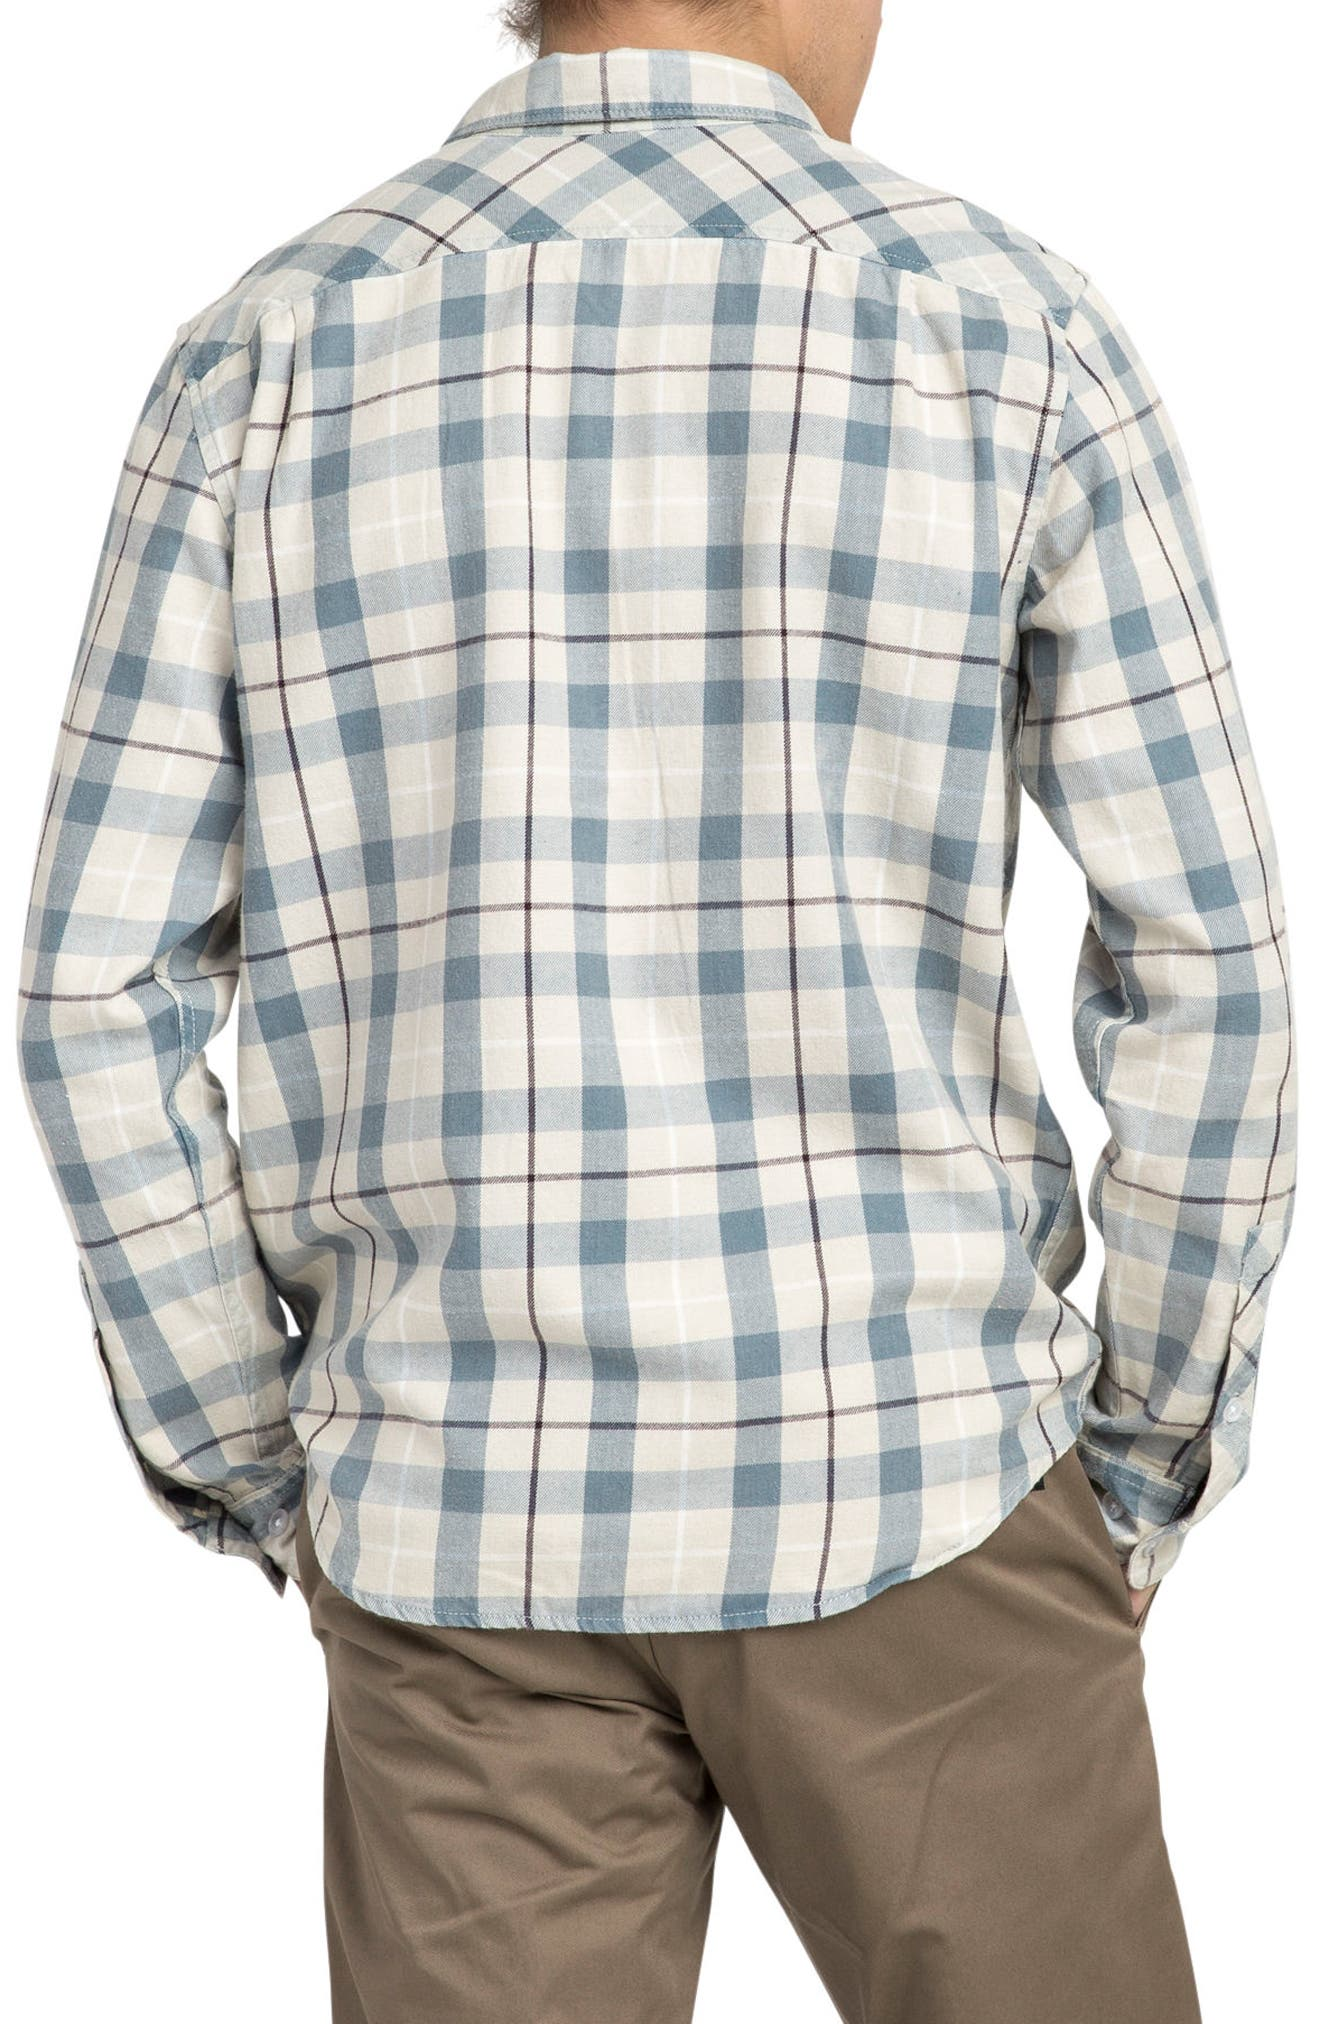 Treets Plaid Flannel Shirt,                             Alternate thumbnail 2, color,                             020